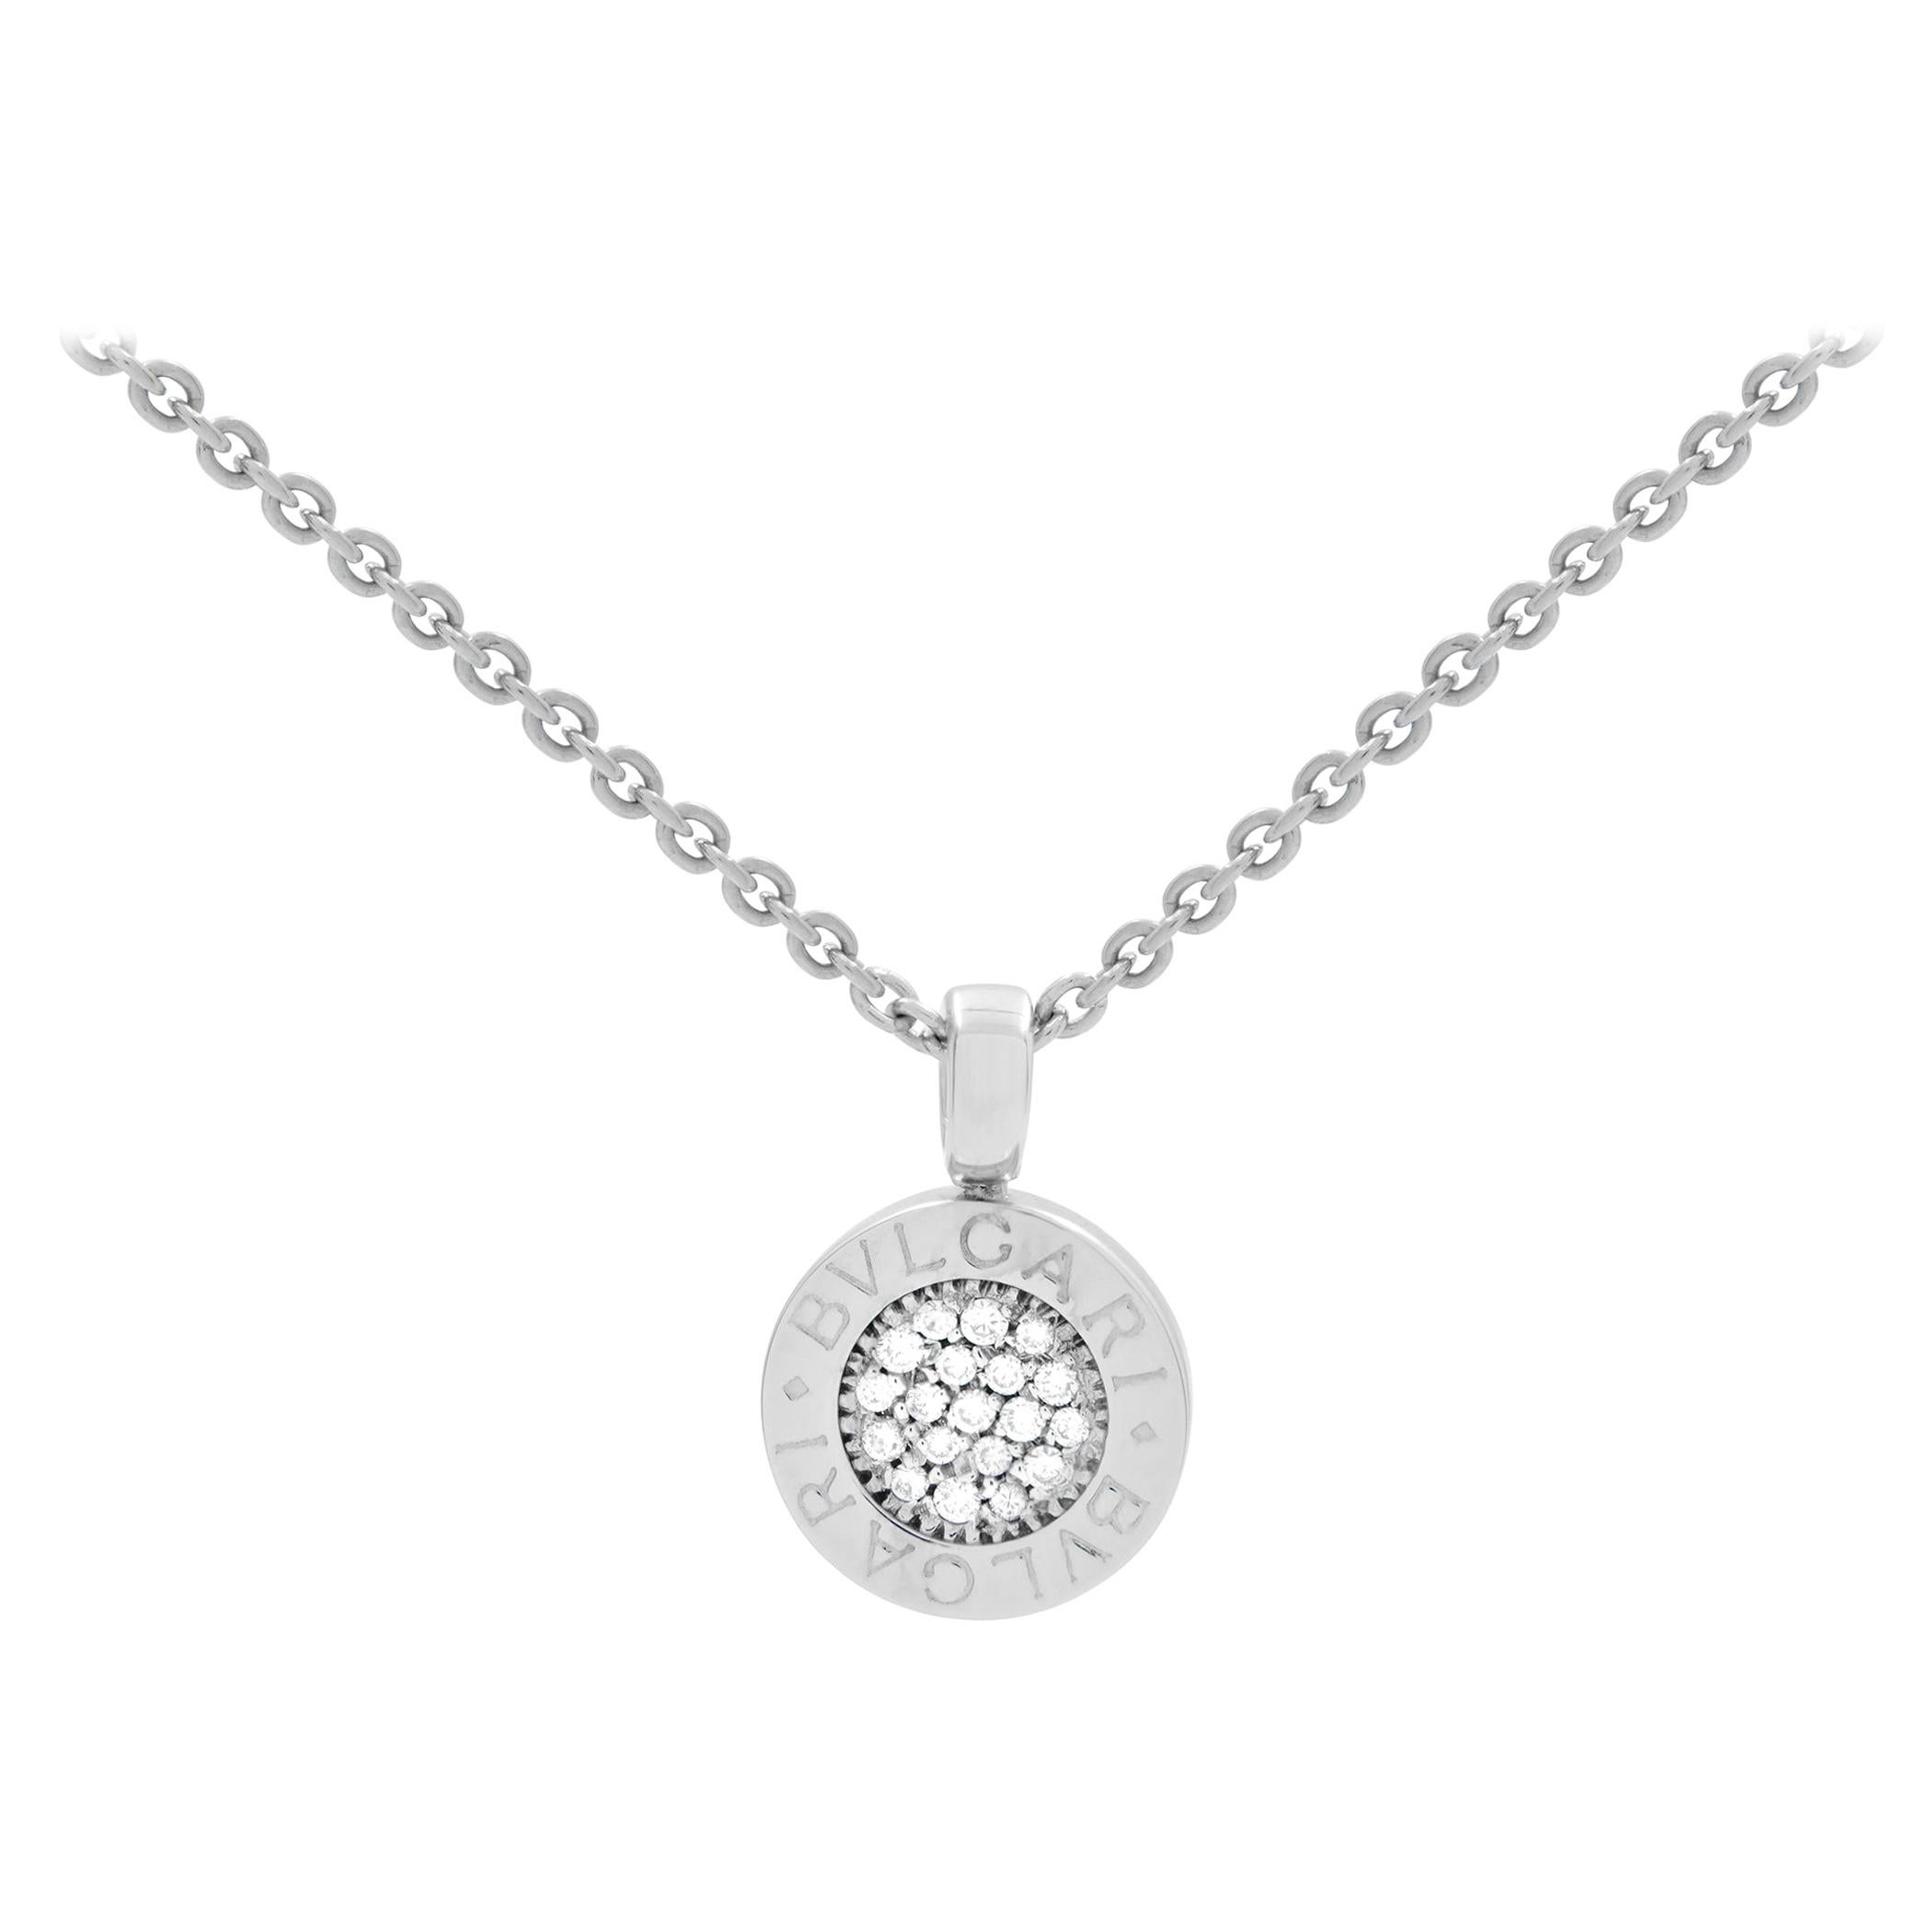 "Bvlgari 18k White Gold Pave Diamond ""Bvlgari-Bvlgari"" Pendant Necklace 0.20cttw"